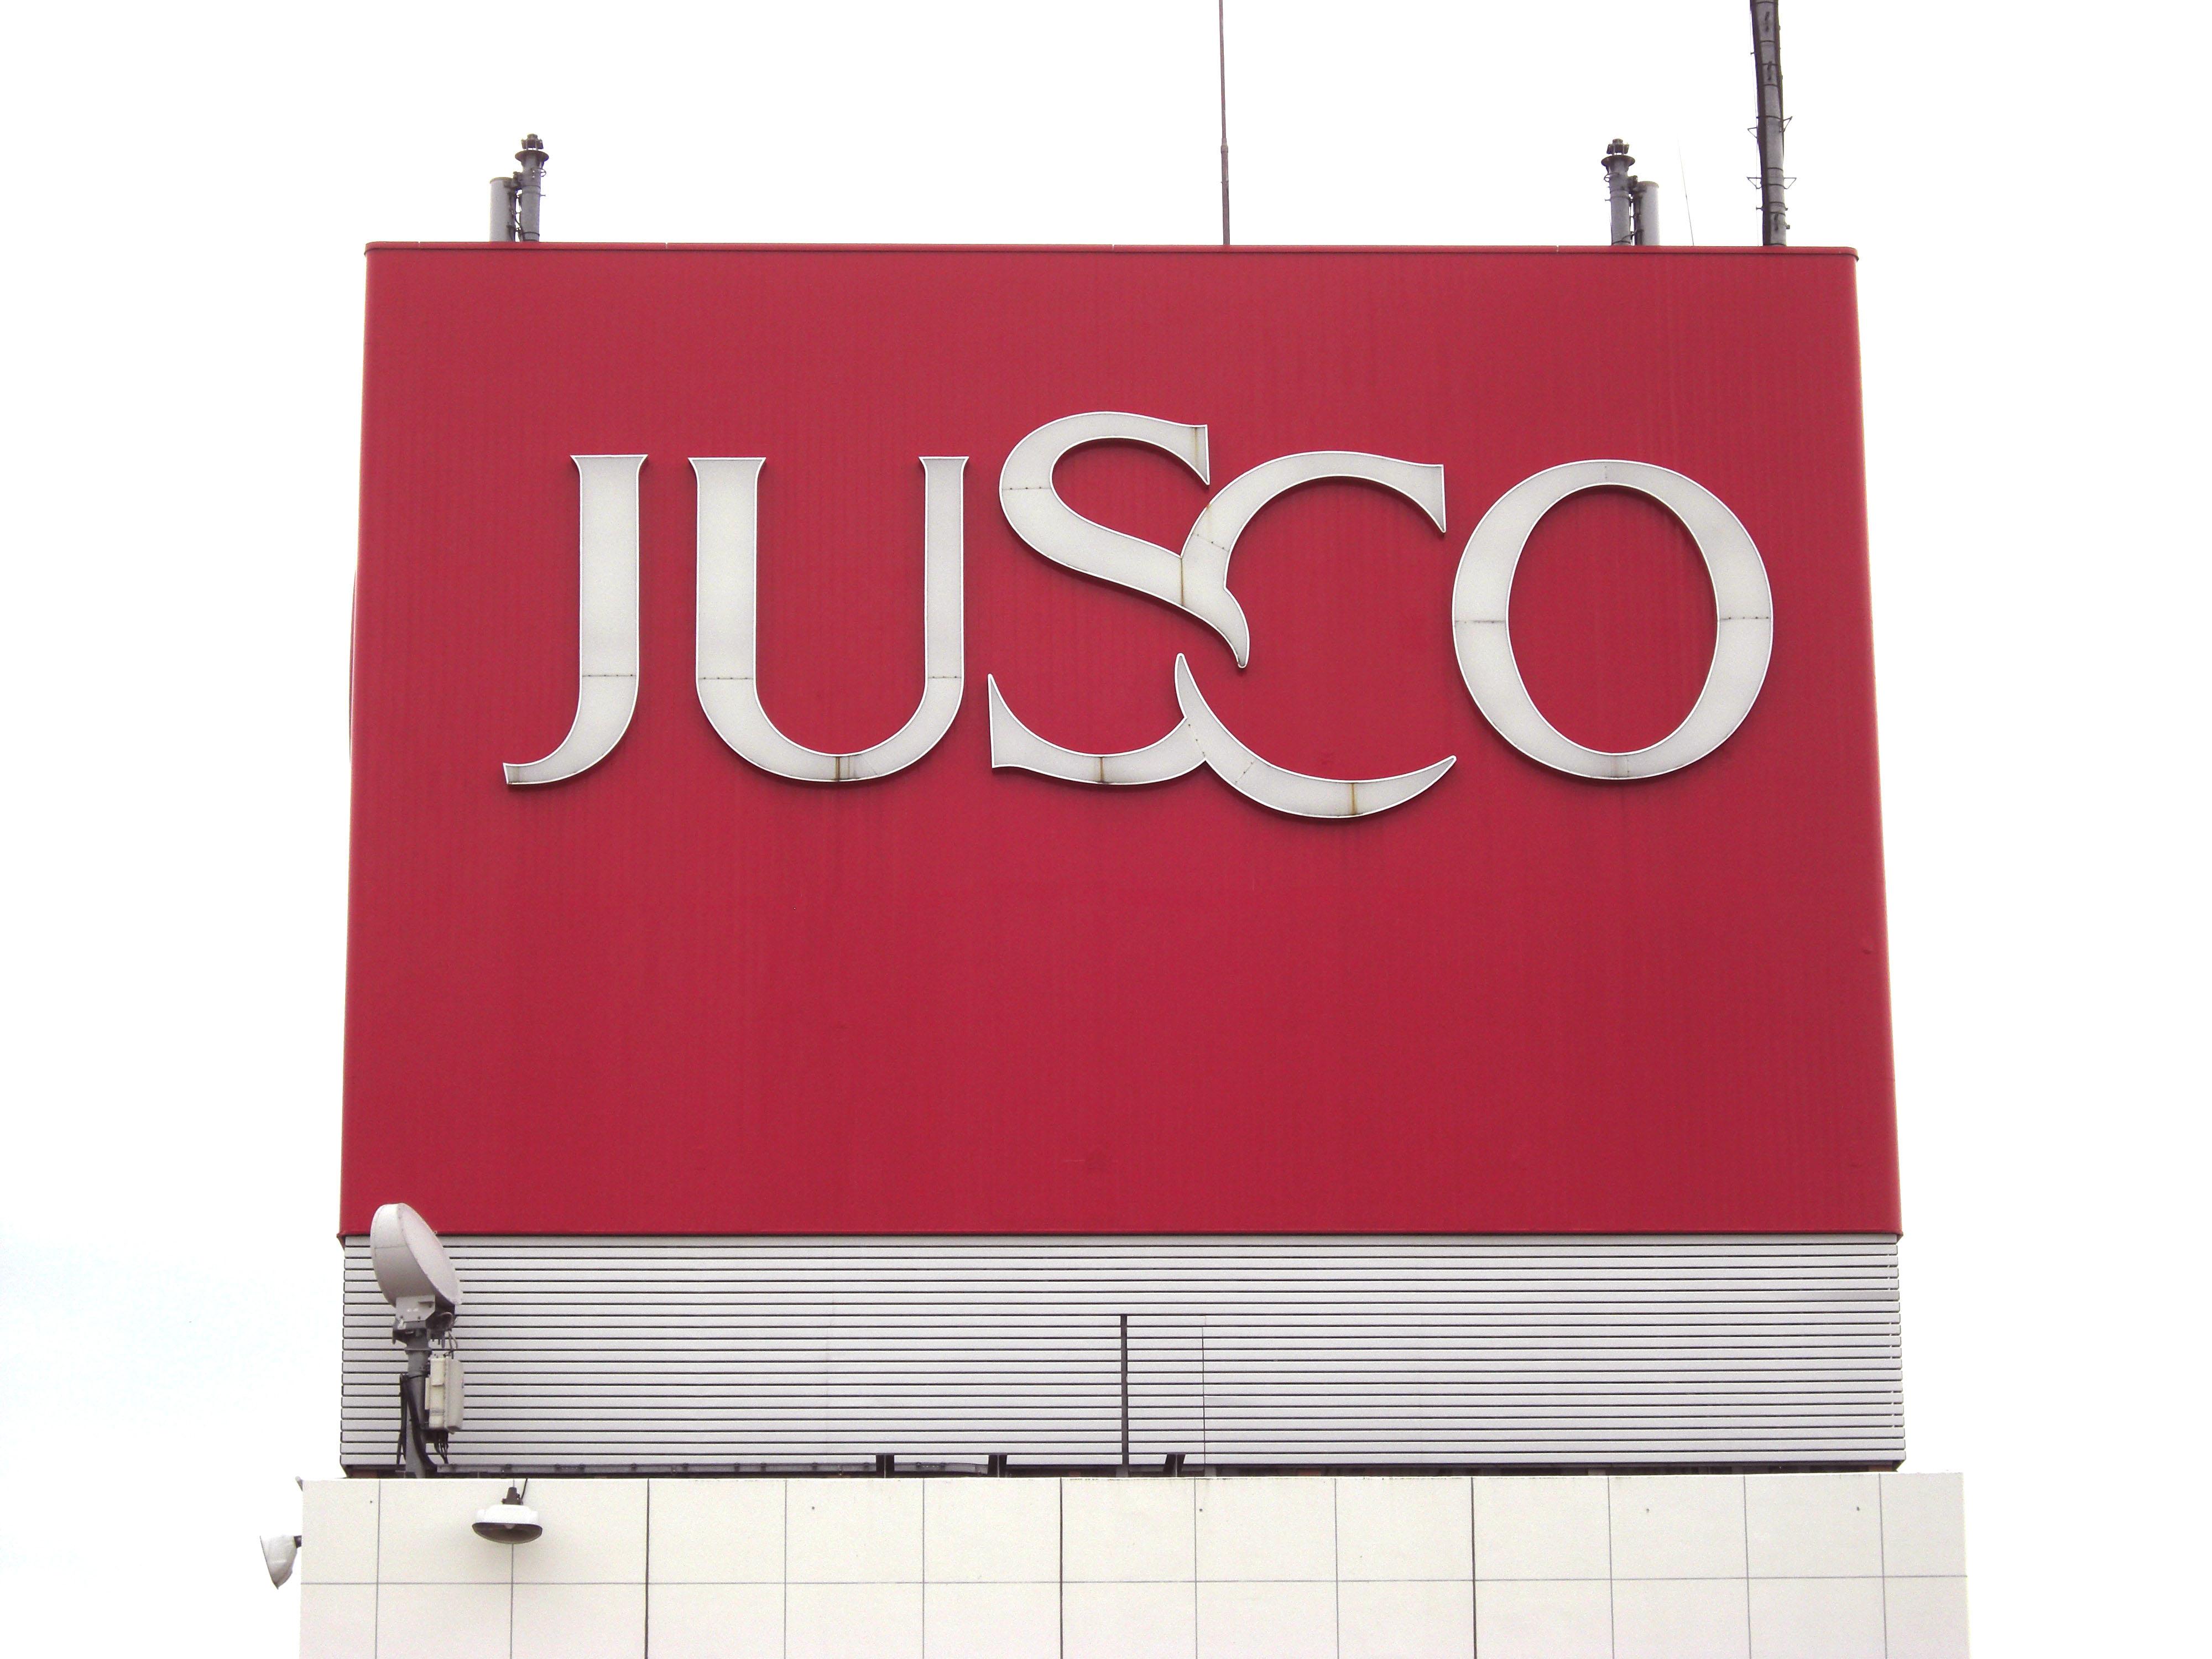 Jusco ibaraki2